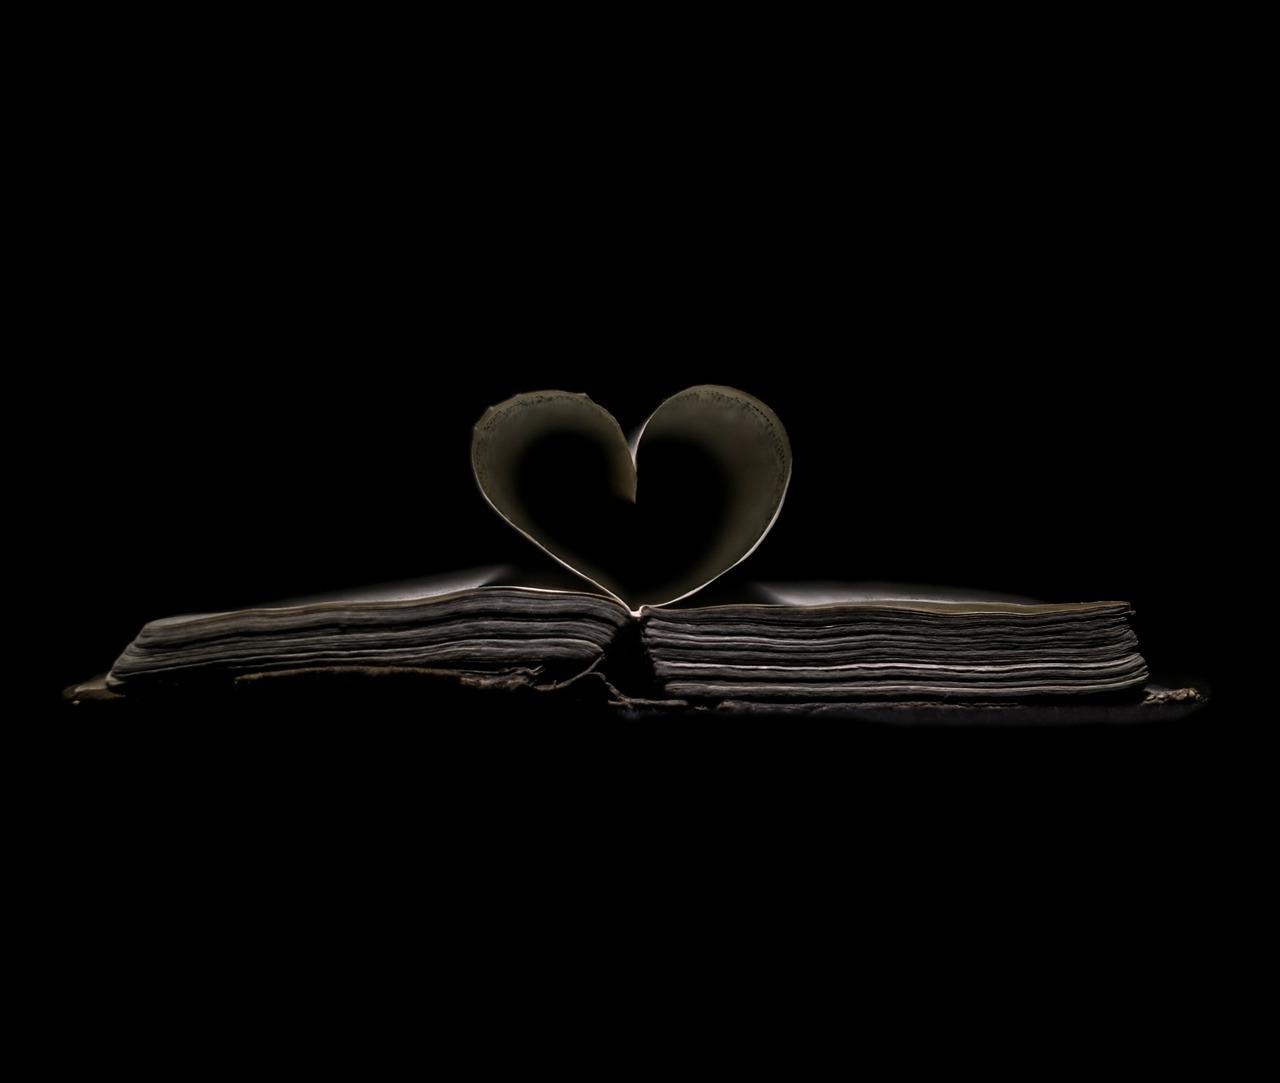 heart-623530_1280